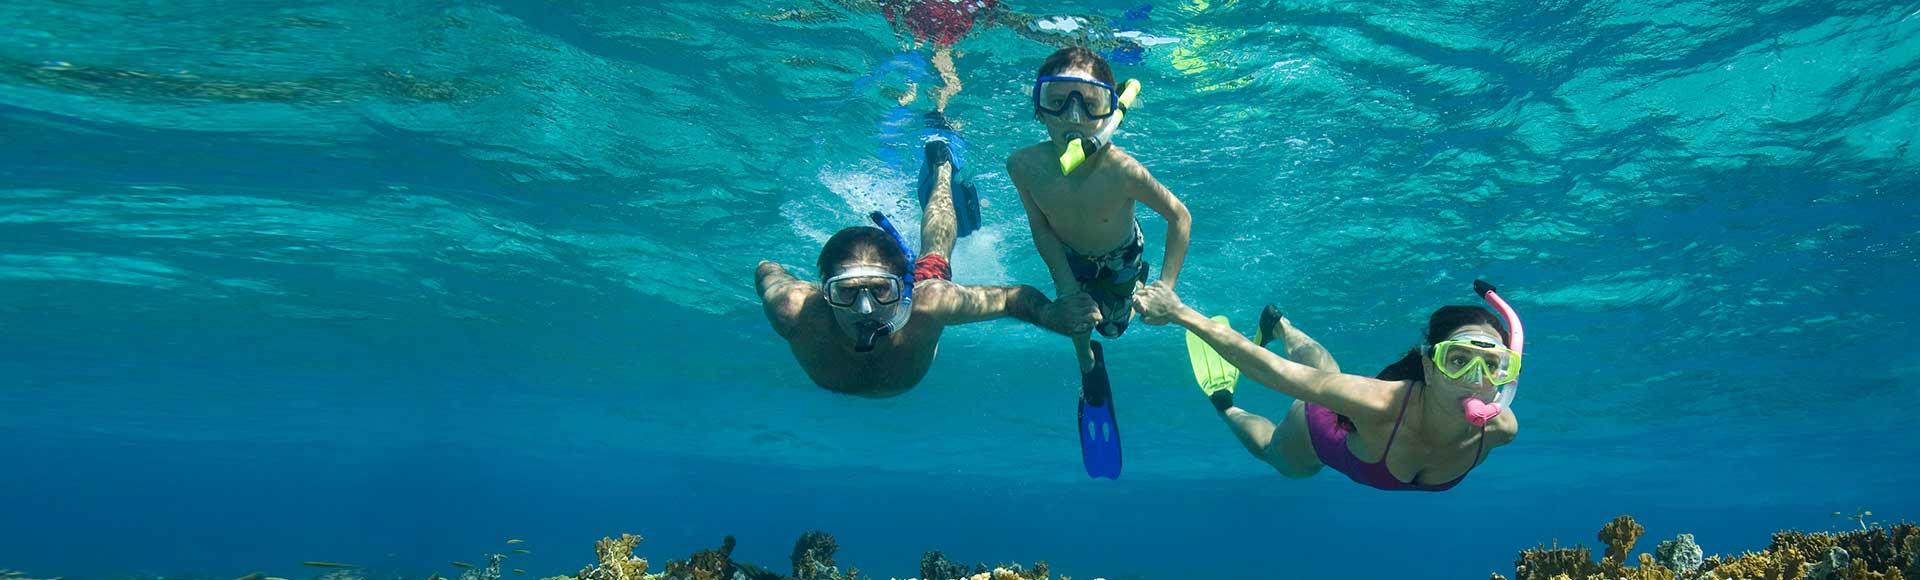 Family snorkeling in Jamaica